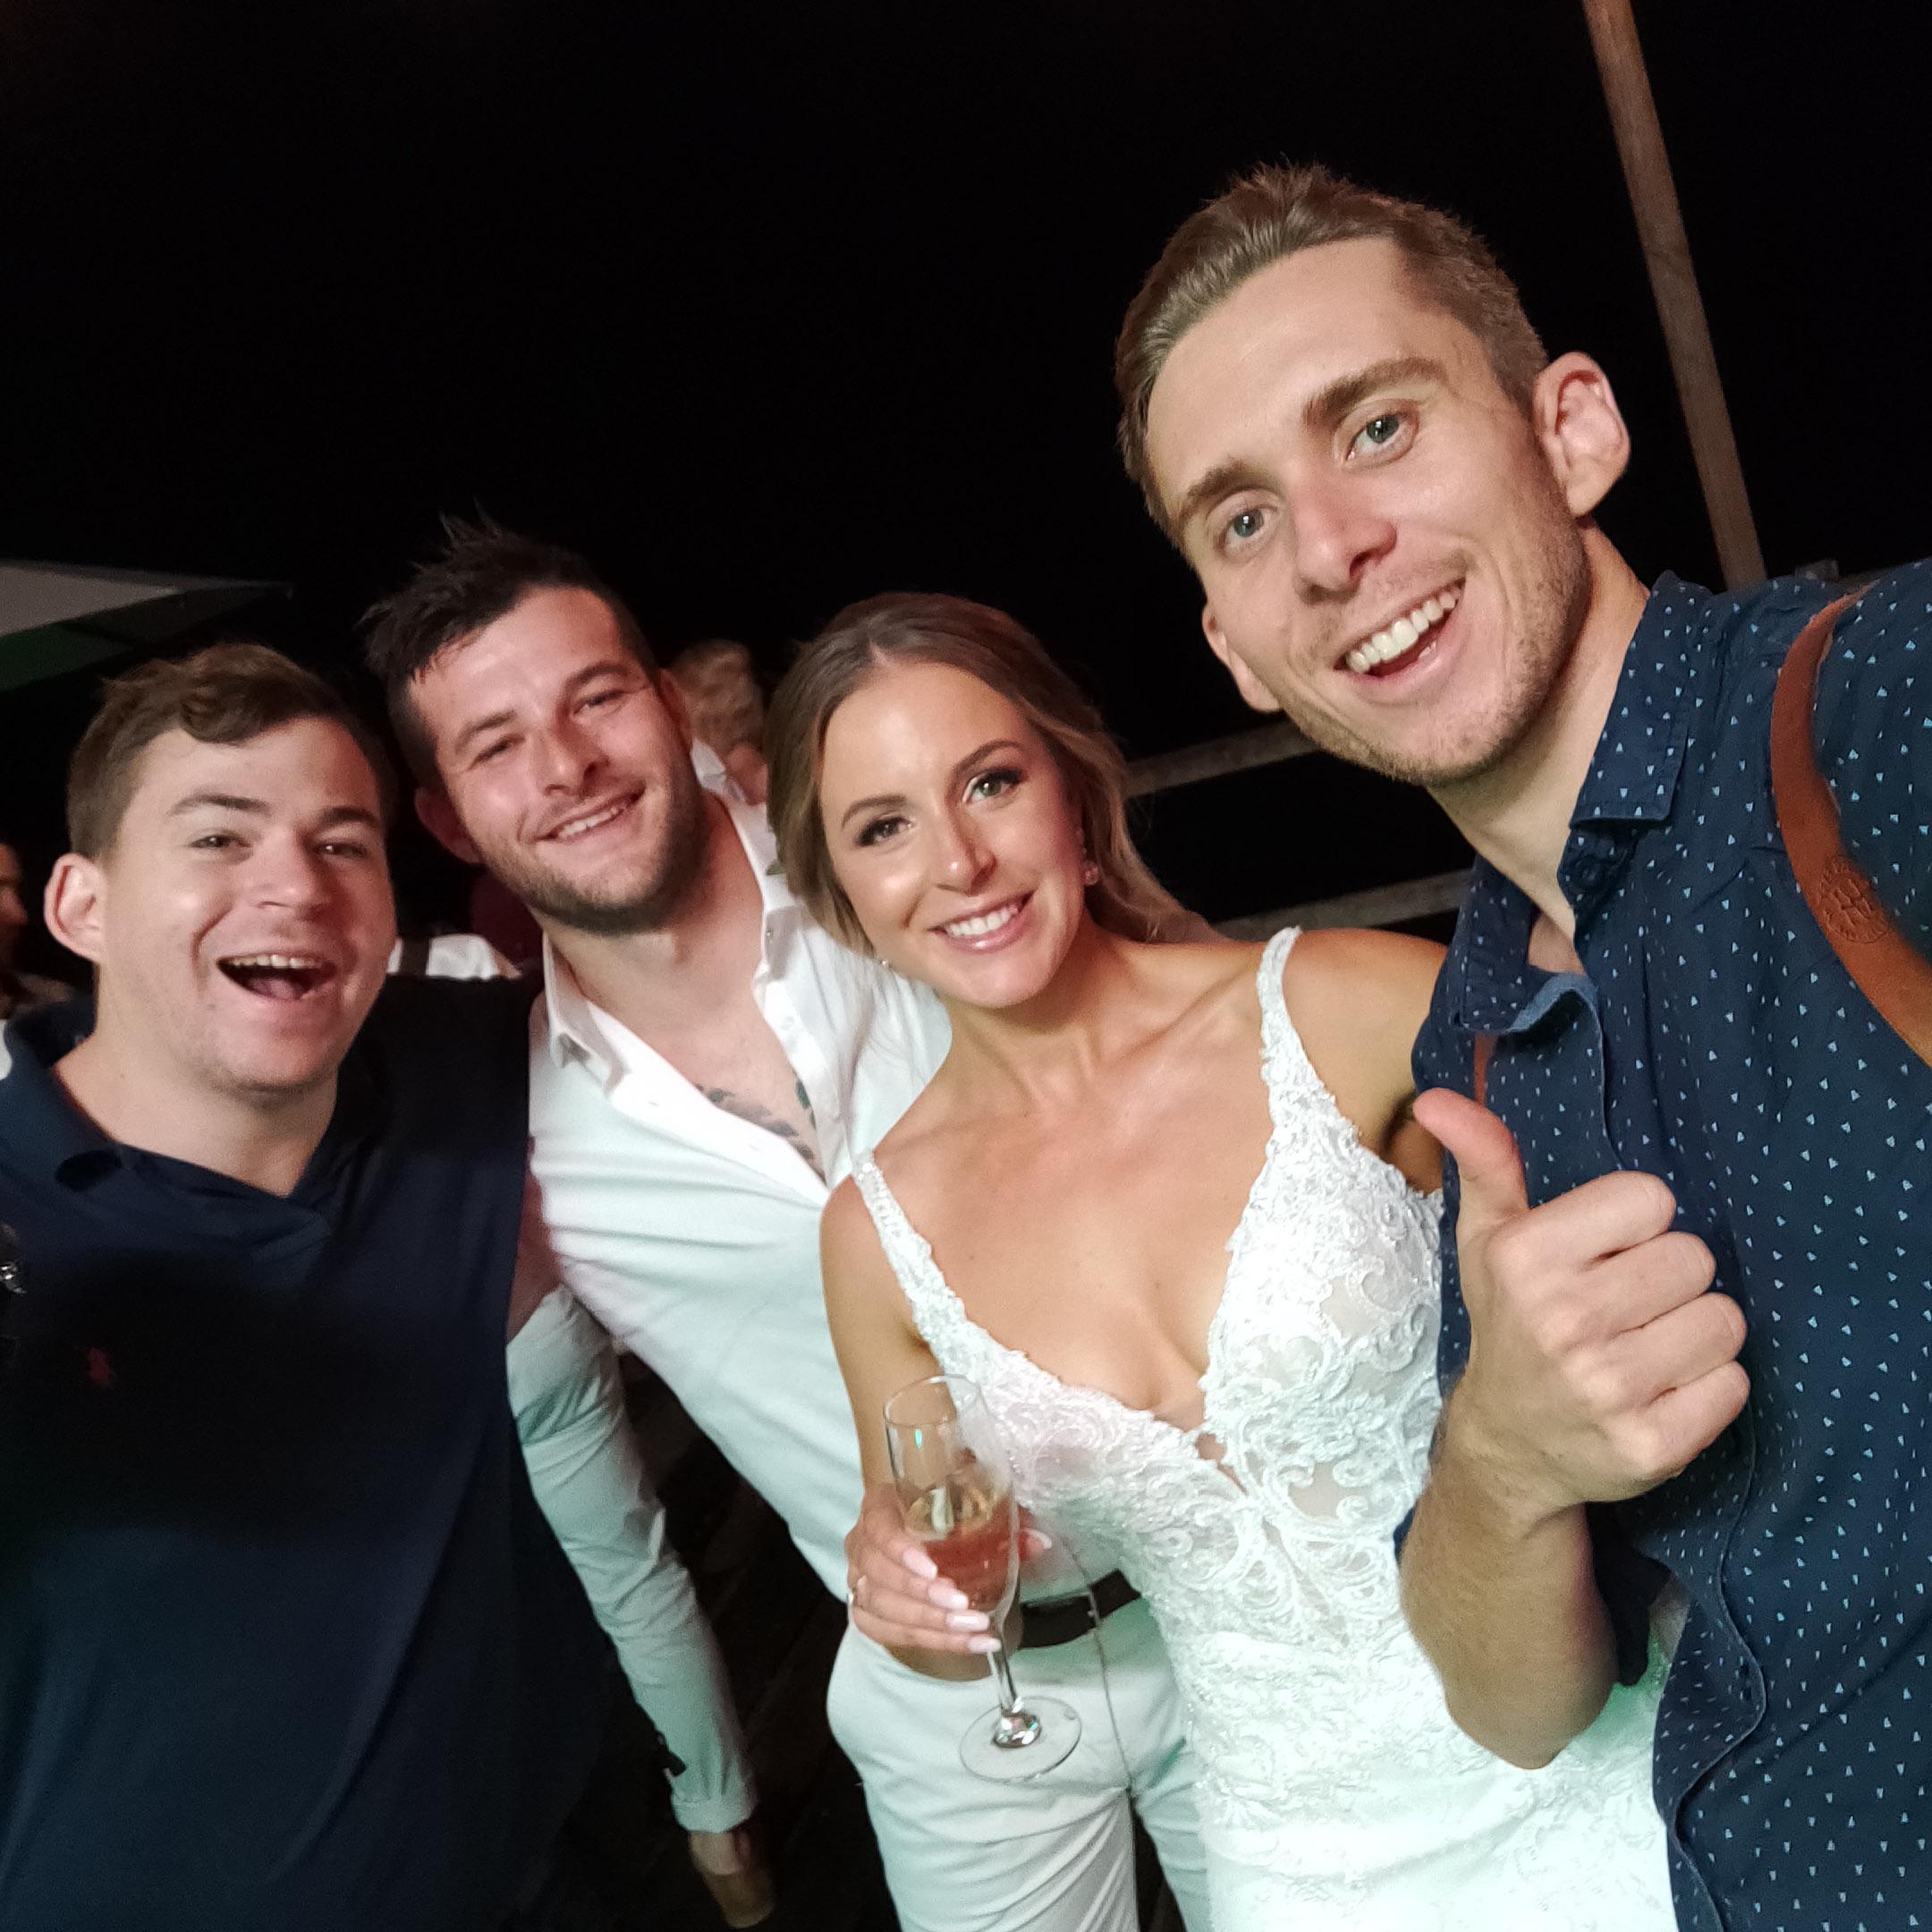 The-raw-photographer-cairns-wedding-photography-bridalparty-selfie-7.jpg